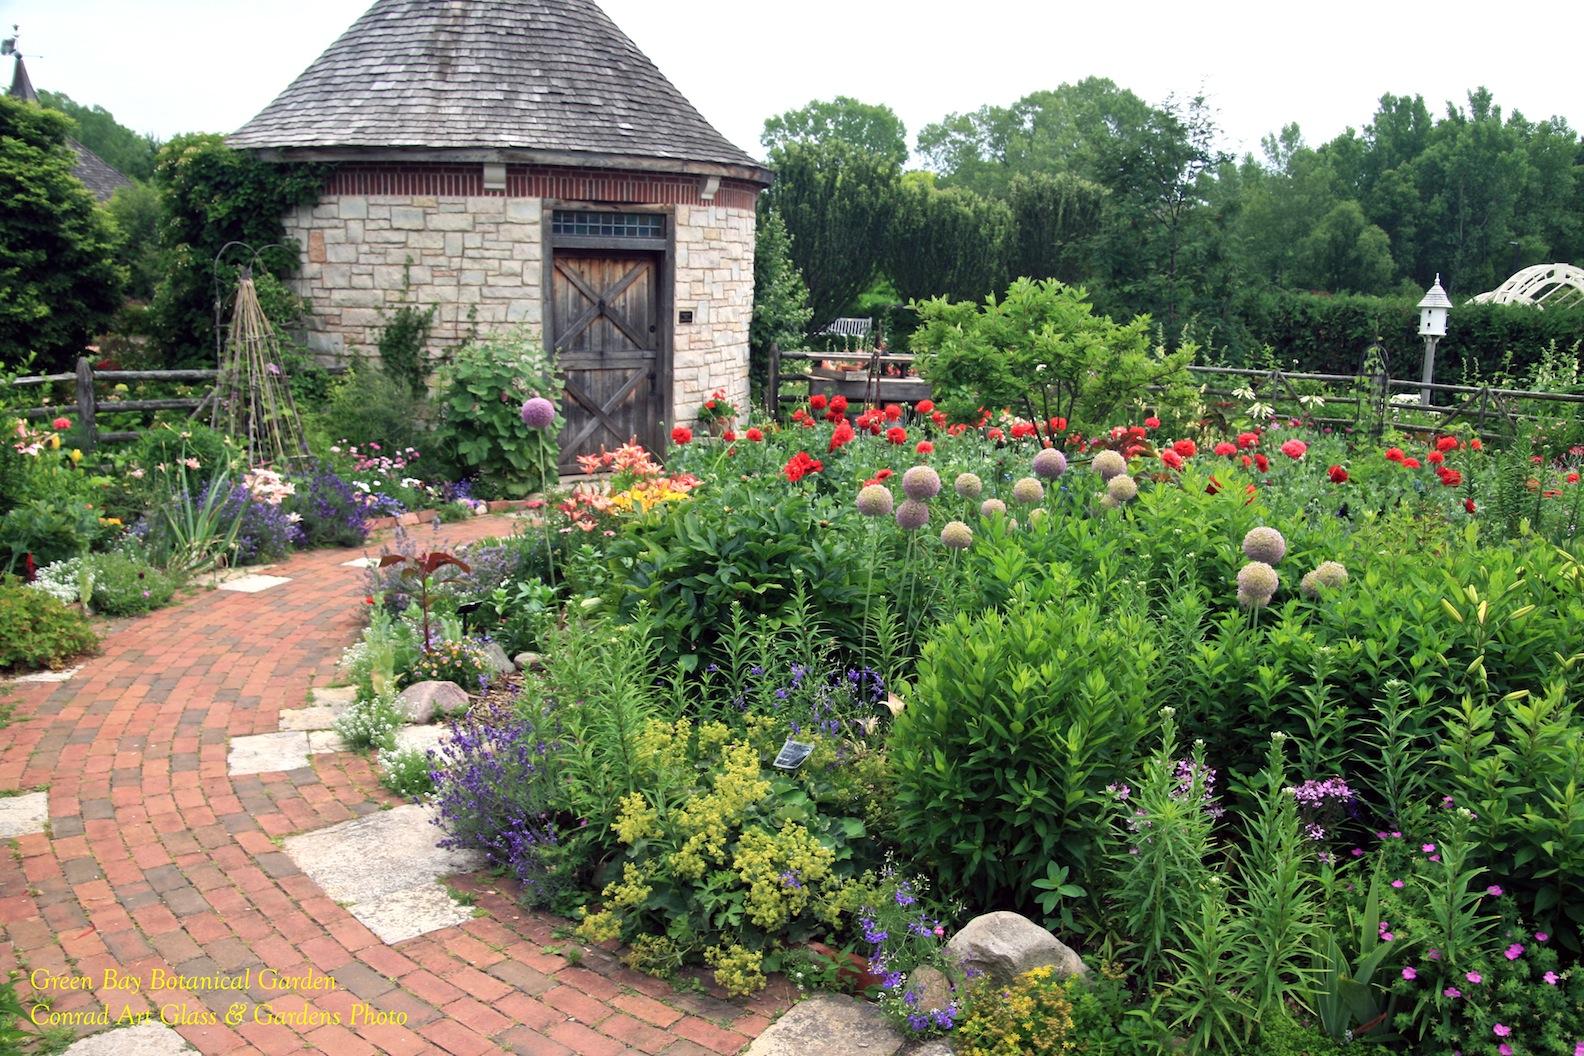 Botanical Garden Green Bay Wi Green Bay Botanical Garden Green Bay Botanical Garden Wisconsin